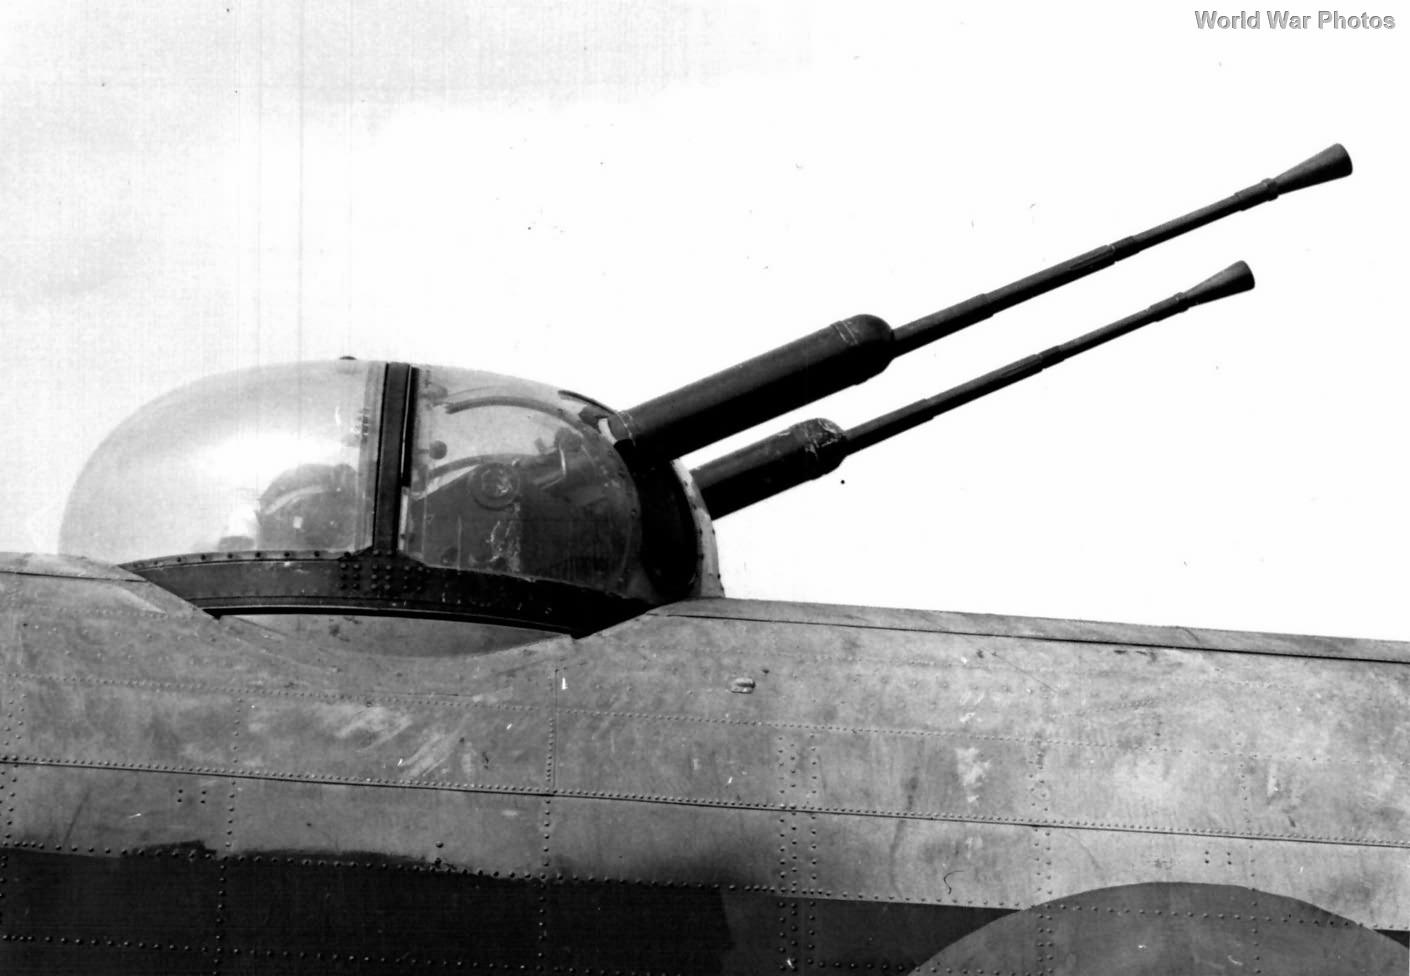 Bristol B.17 mid-upper turret with twin 20 mm Hispano cannon